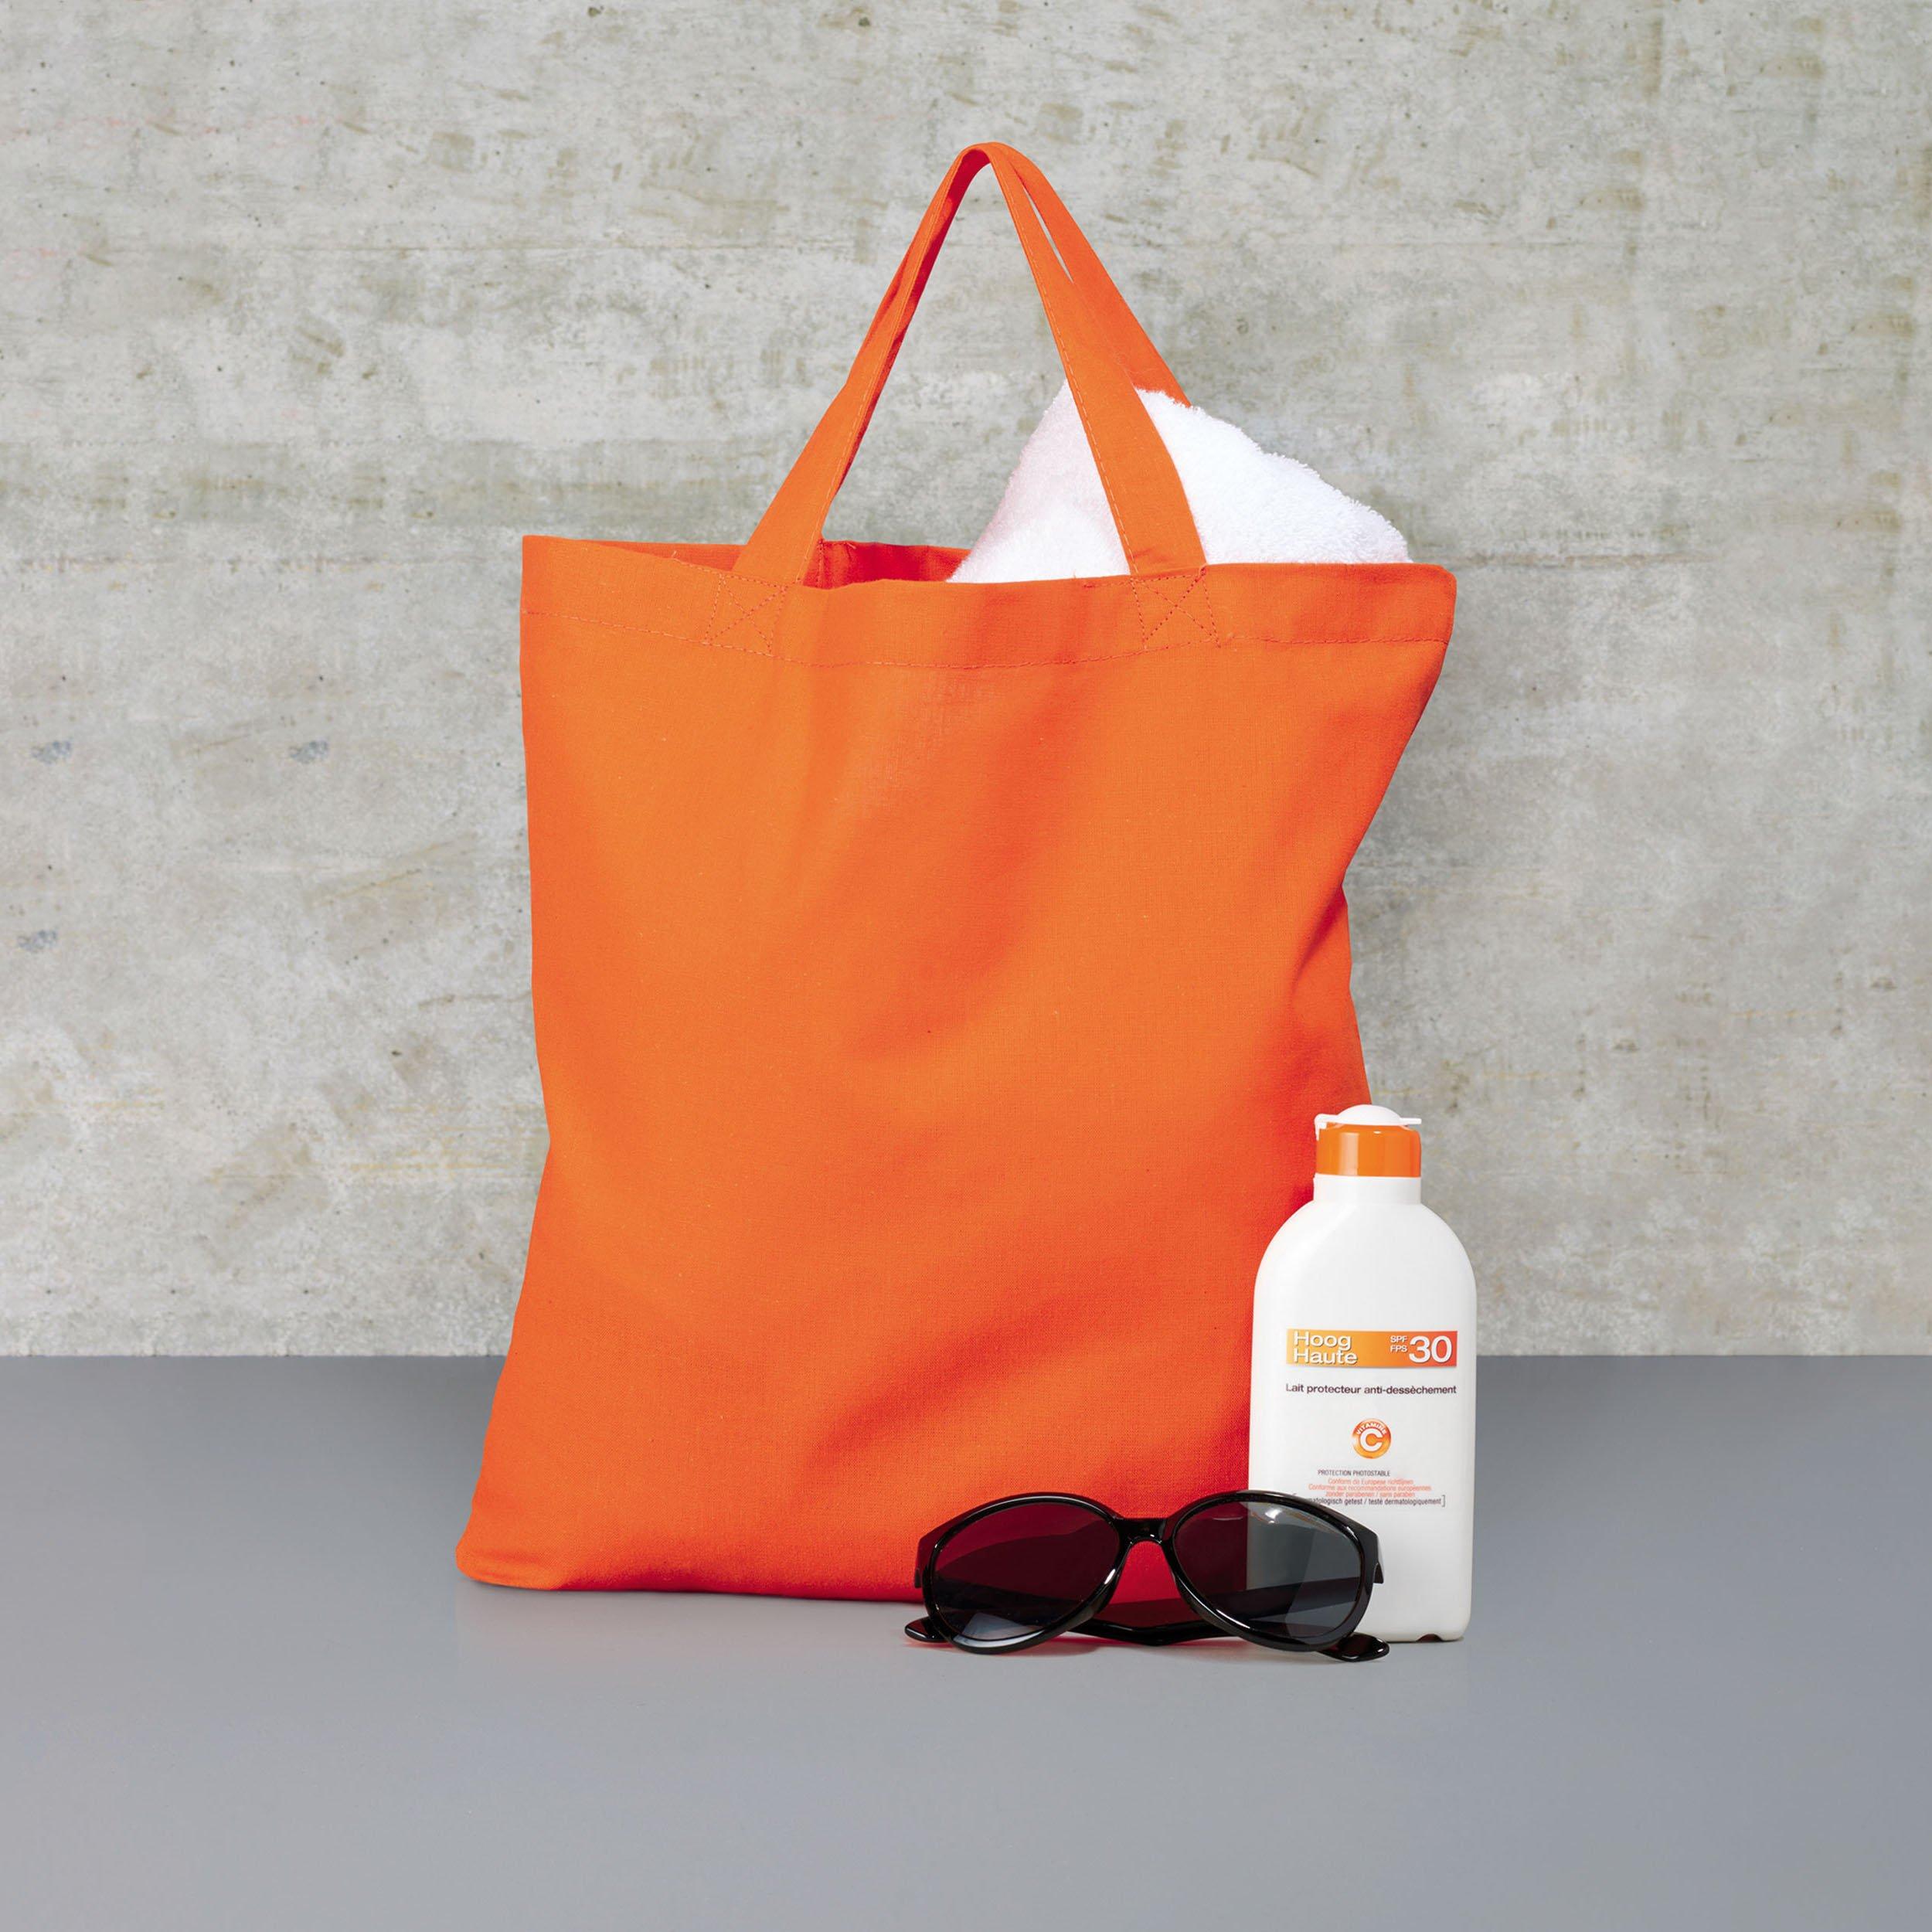 Bags by Jassz Cedar totebag